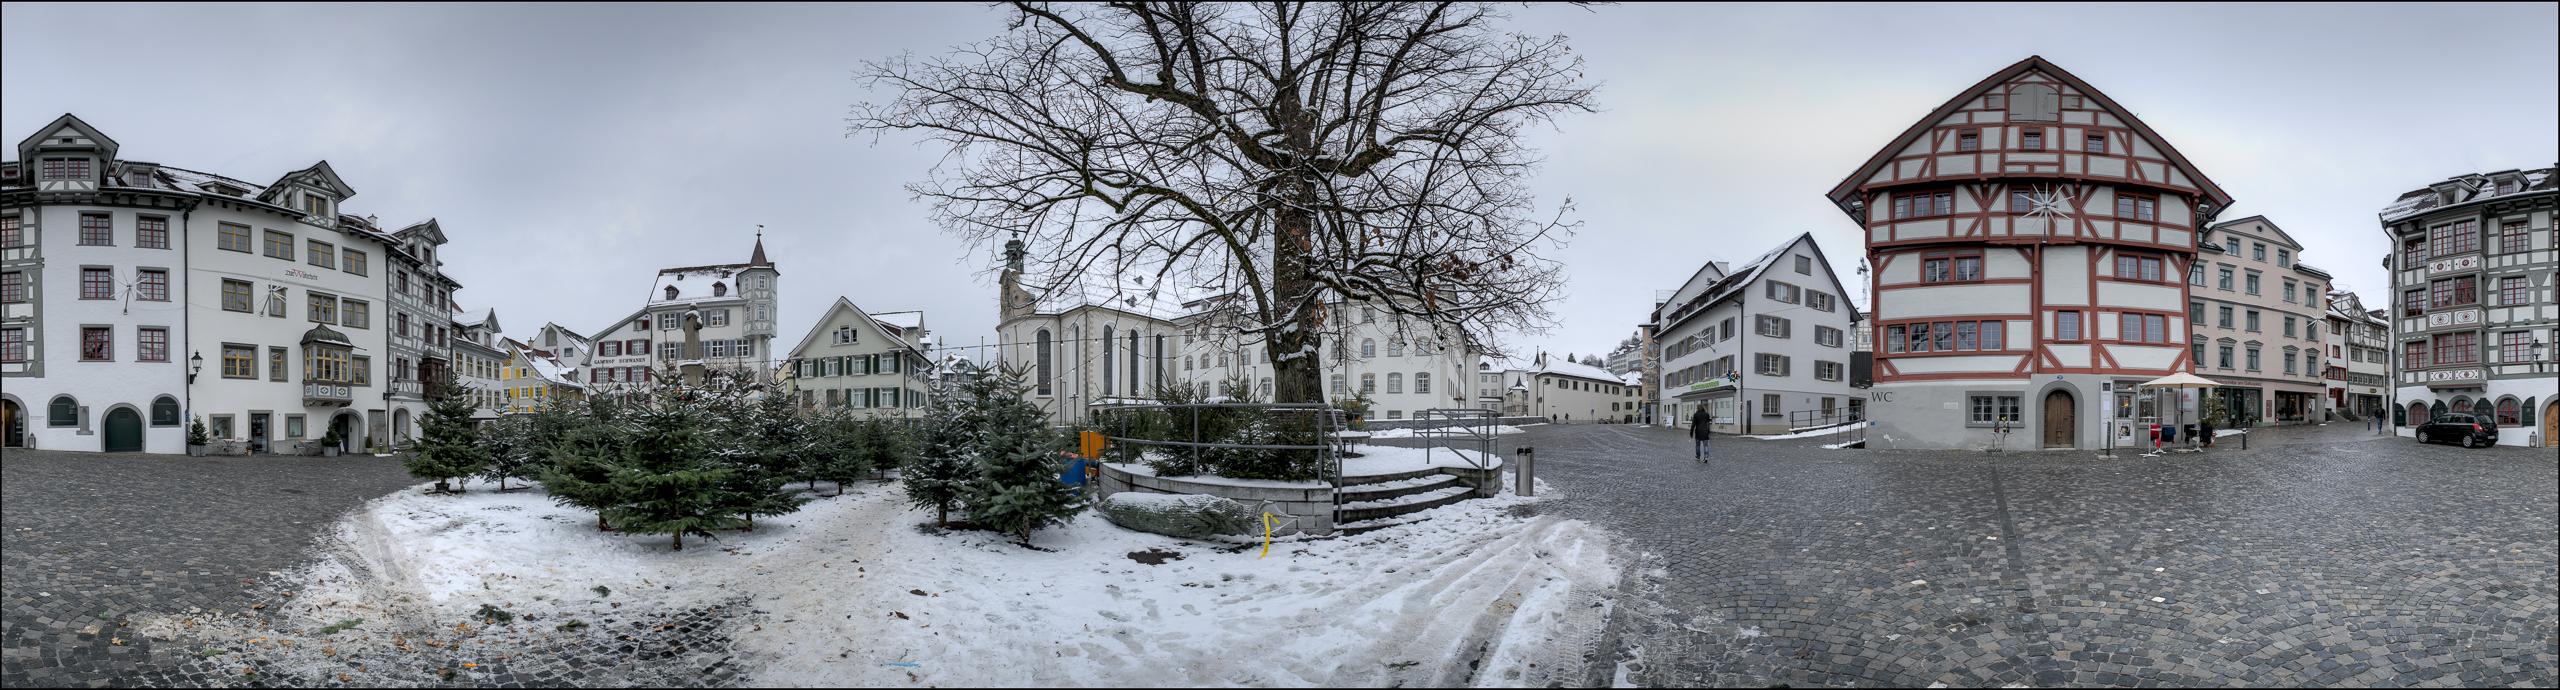 Quartierverein-Gallusplatz-Panorama-Dezember- 2017-1